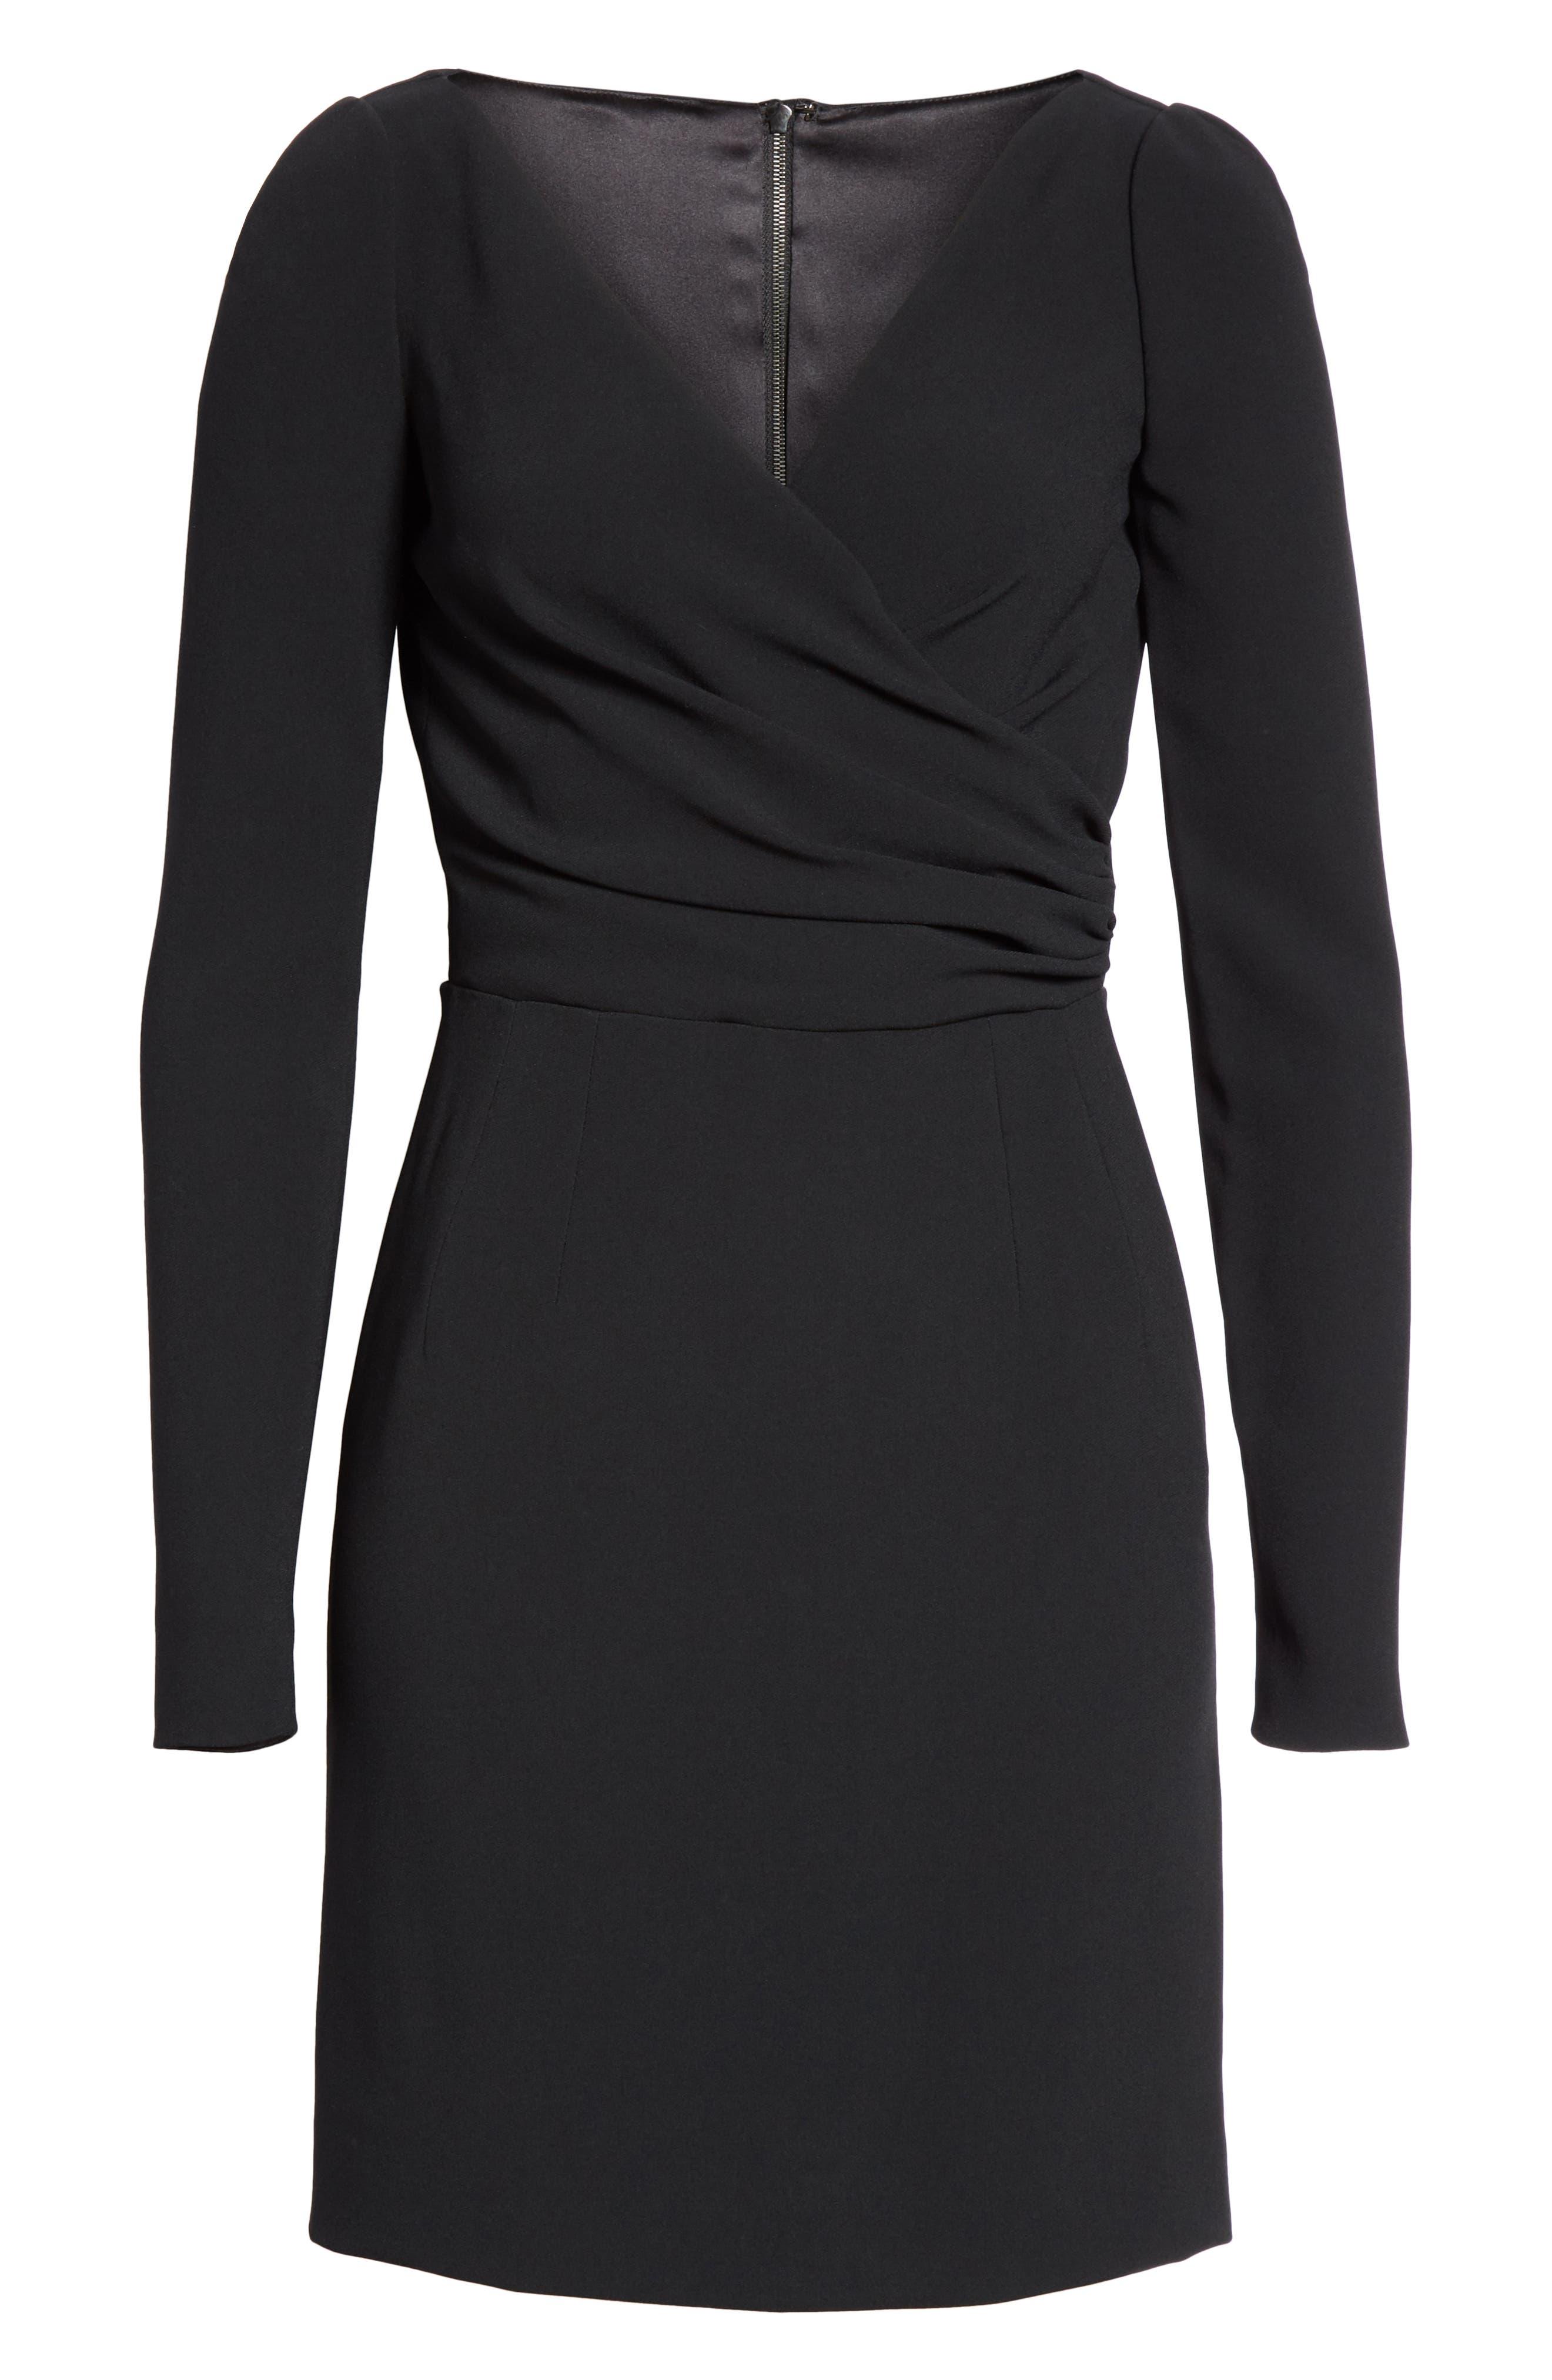 Surplice Dress,                             Alternate thumbnail 7, color,                             BLACK